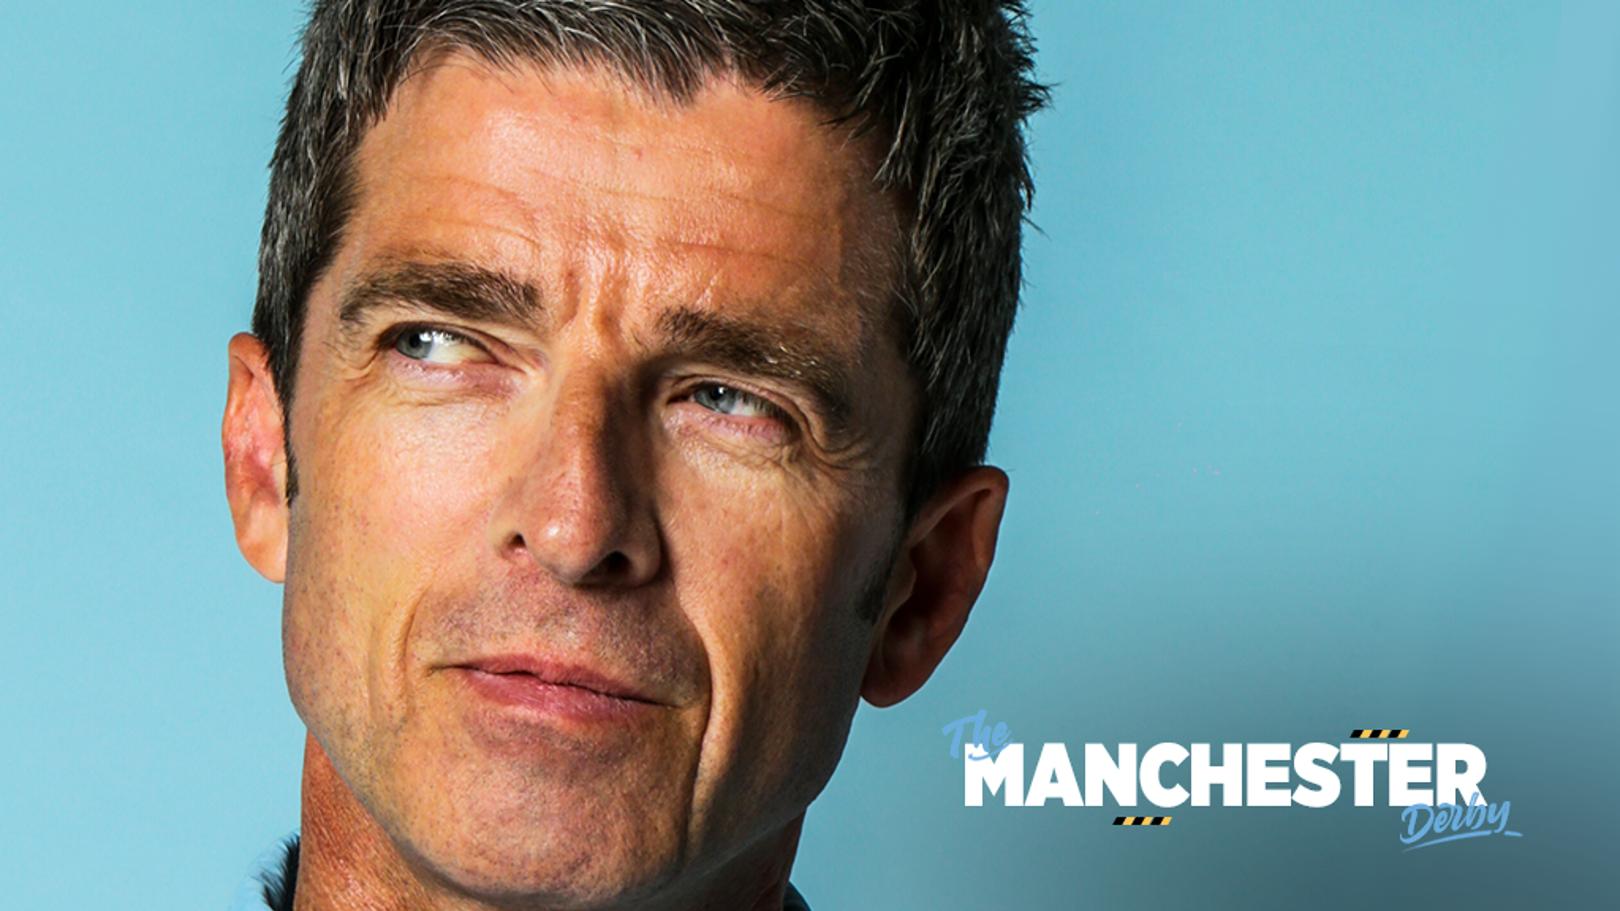 PLAYLIST: Noel Gallagher membagikan daftar laga untuk derby Manchester